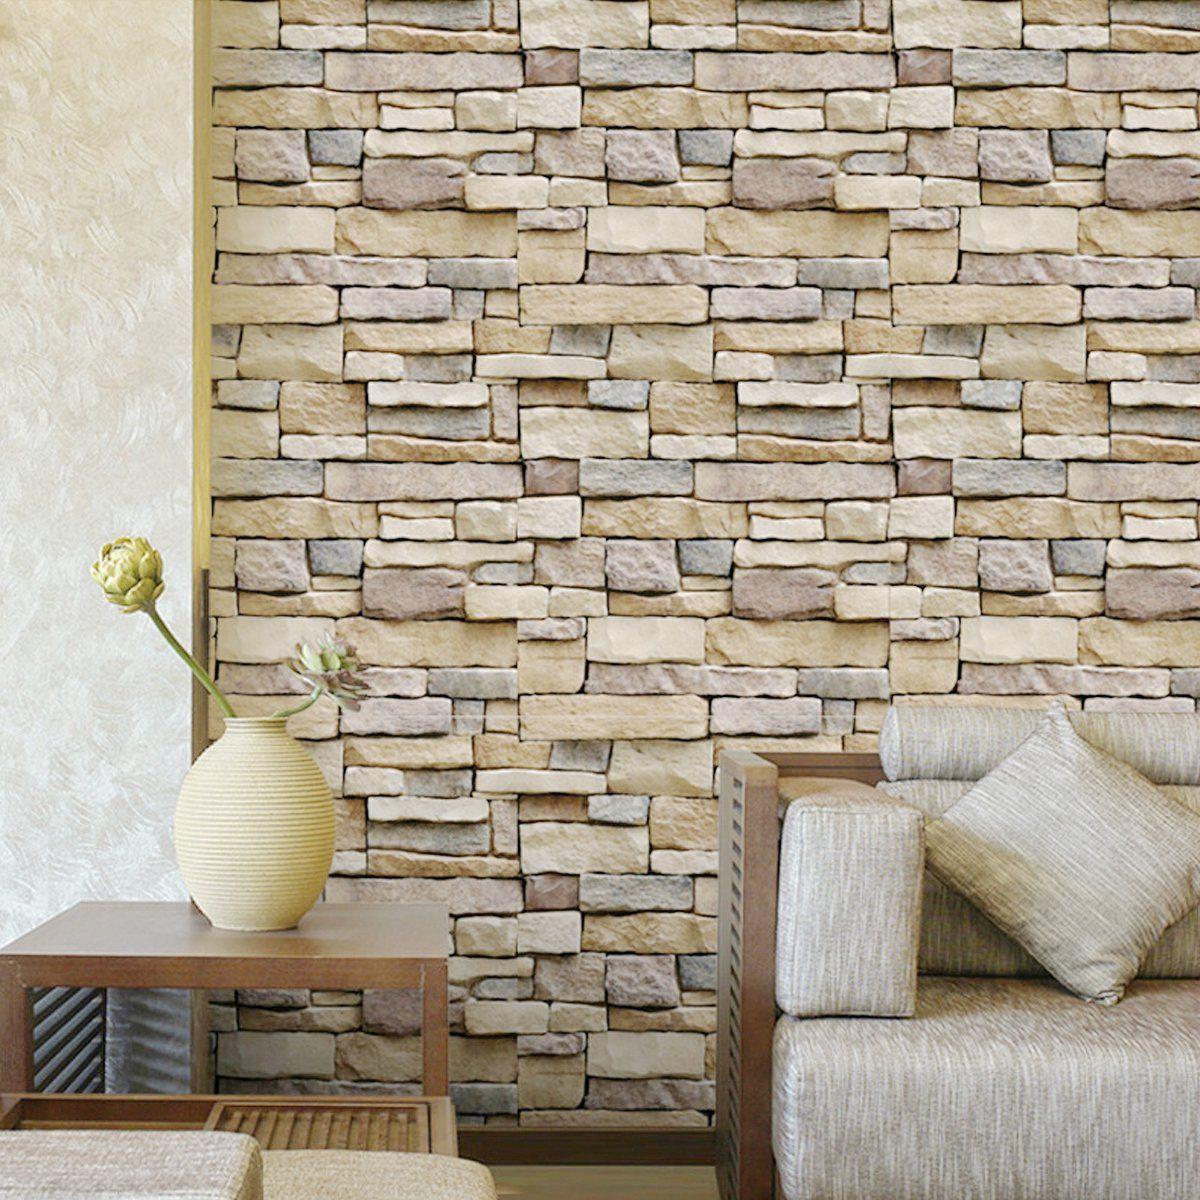 Self Adhesive 3d Brick Schist Wallpaper Sticker Film Wall Sticker Roll 10mx45cm Vinyl Mural Bedroom Living Room Home Decoration Walmart Com In 2021 Brick Wallpaper Wall Stickers Brick Wall Stickers Wallpaper